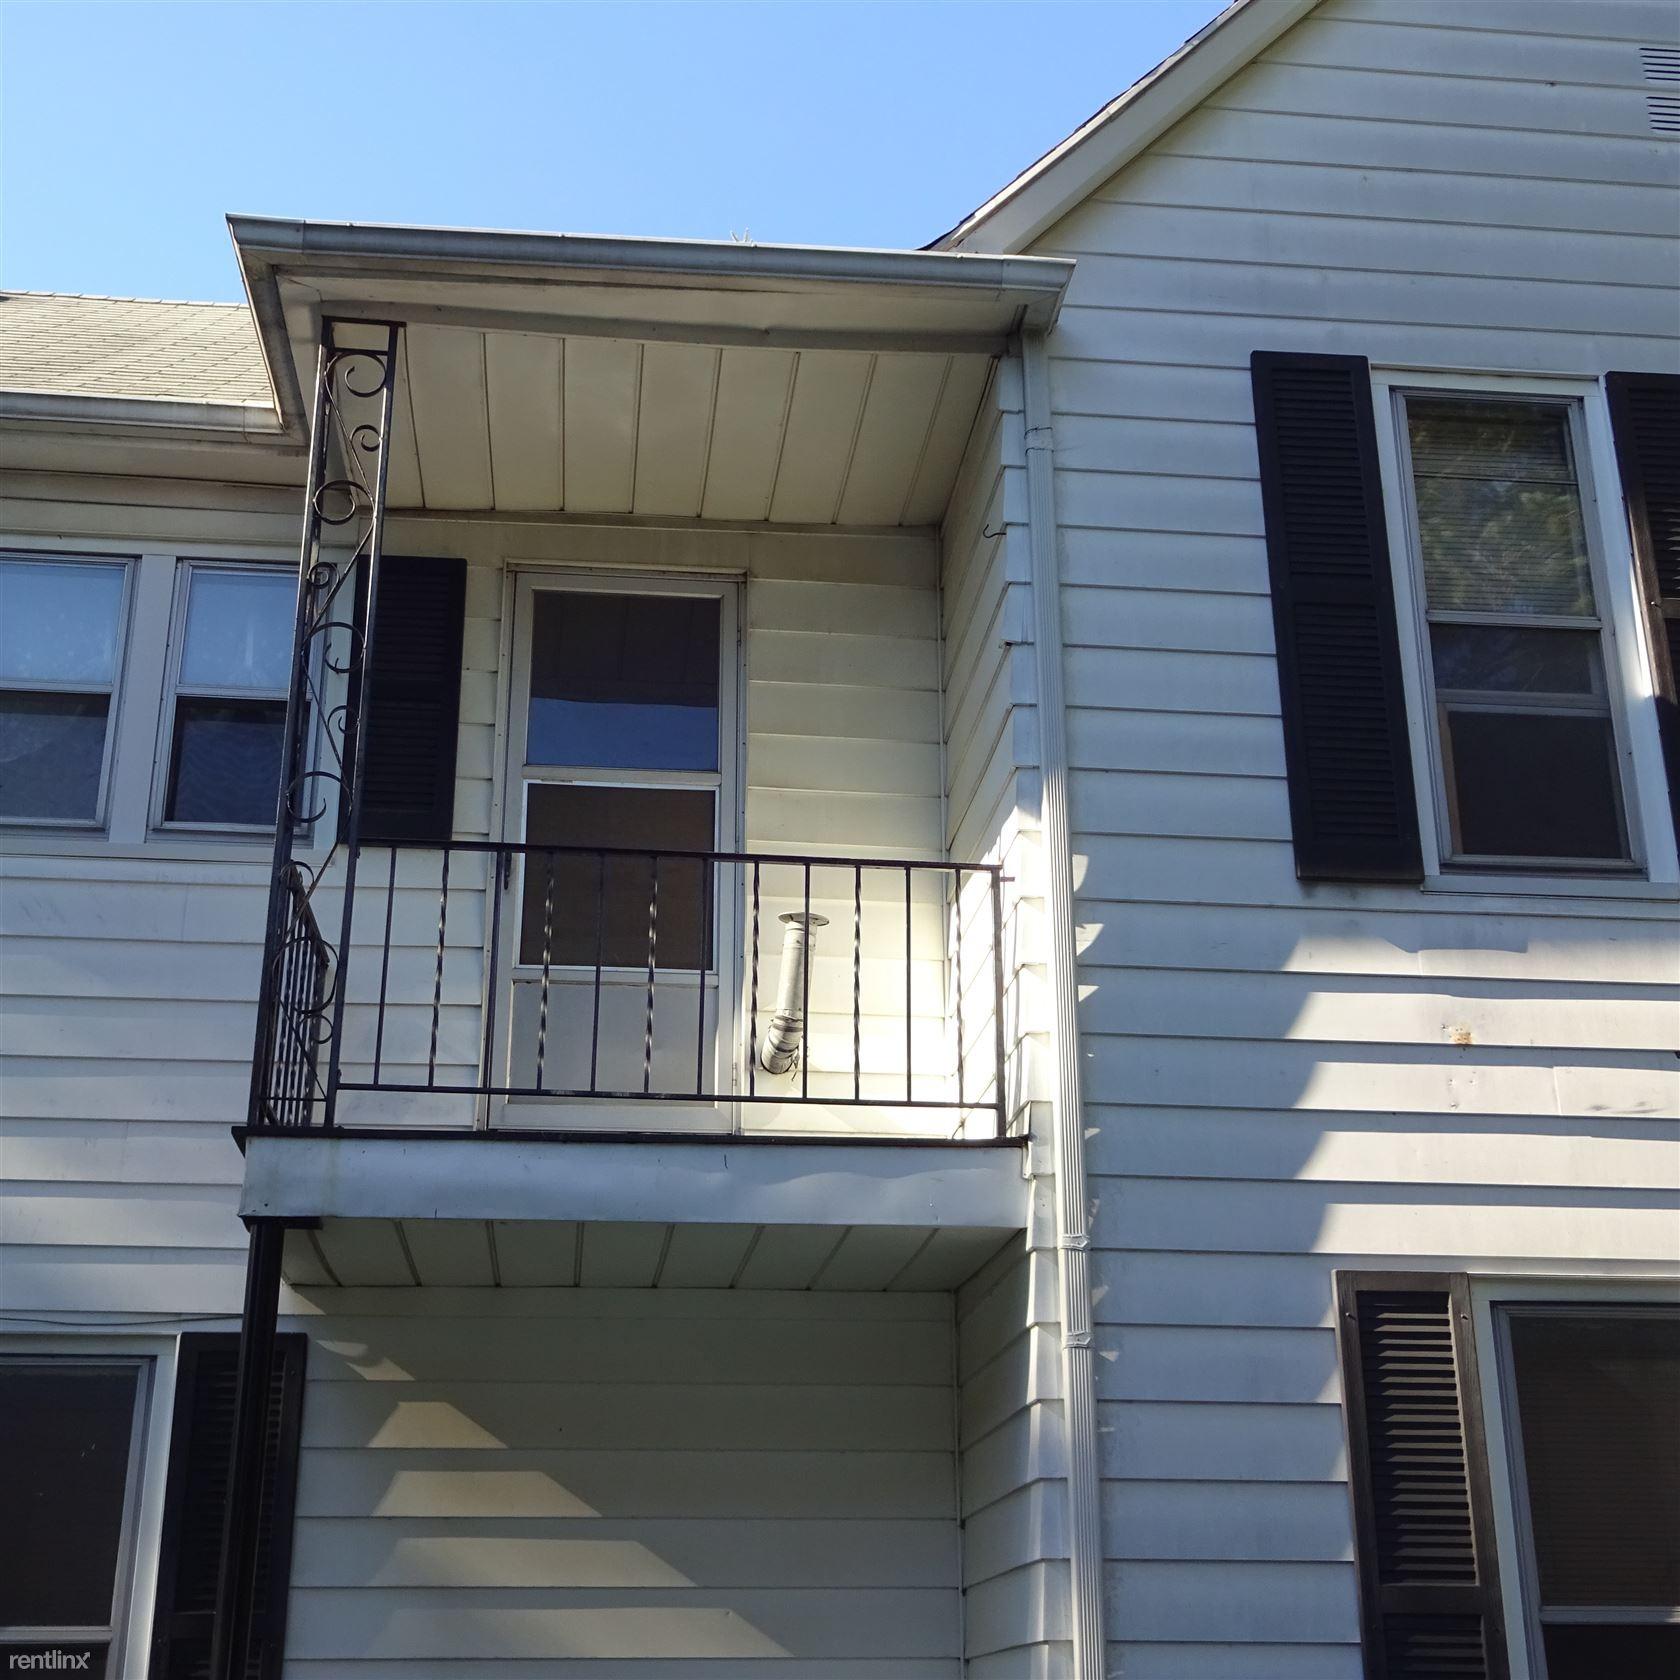 3 Bedroom Apartments In Michigan: 1425 Quarry Ave NW #2, Grand Rapids, MI 49504